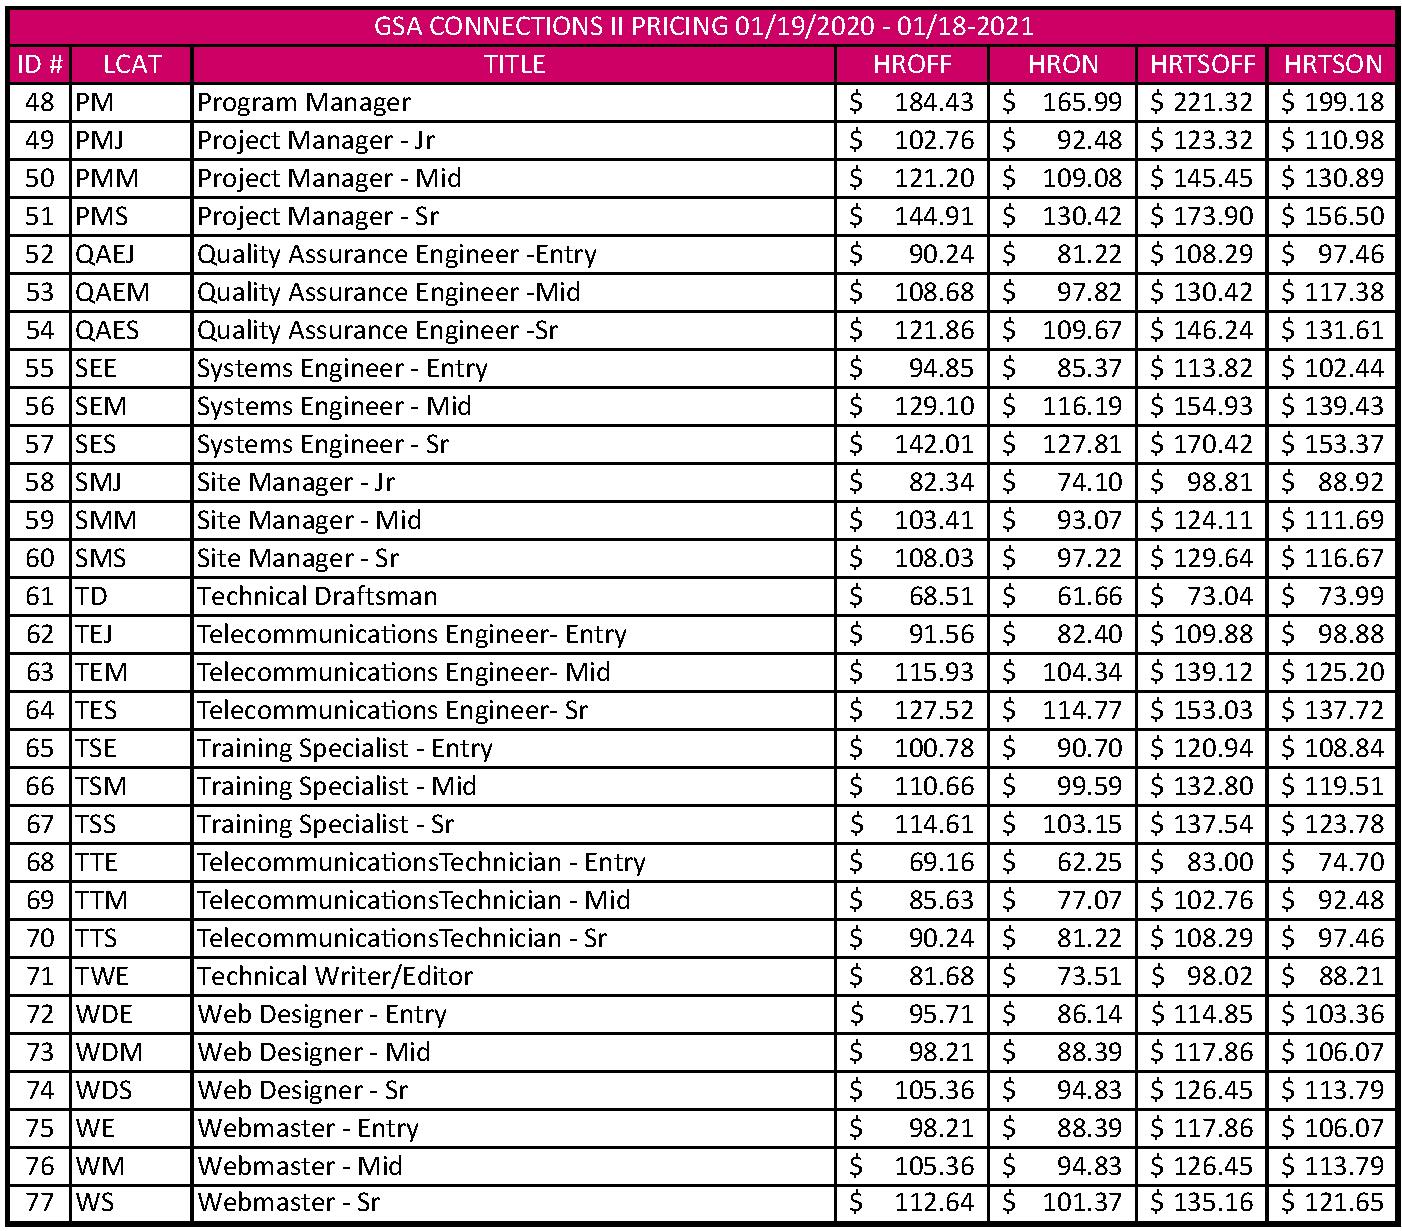 ATS CNX II 2020 - 2021 Labor Rates_Page_2